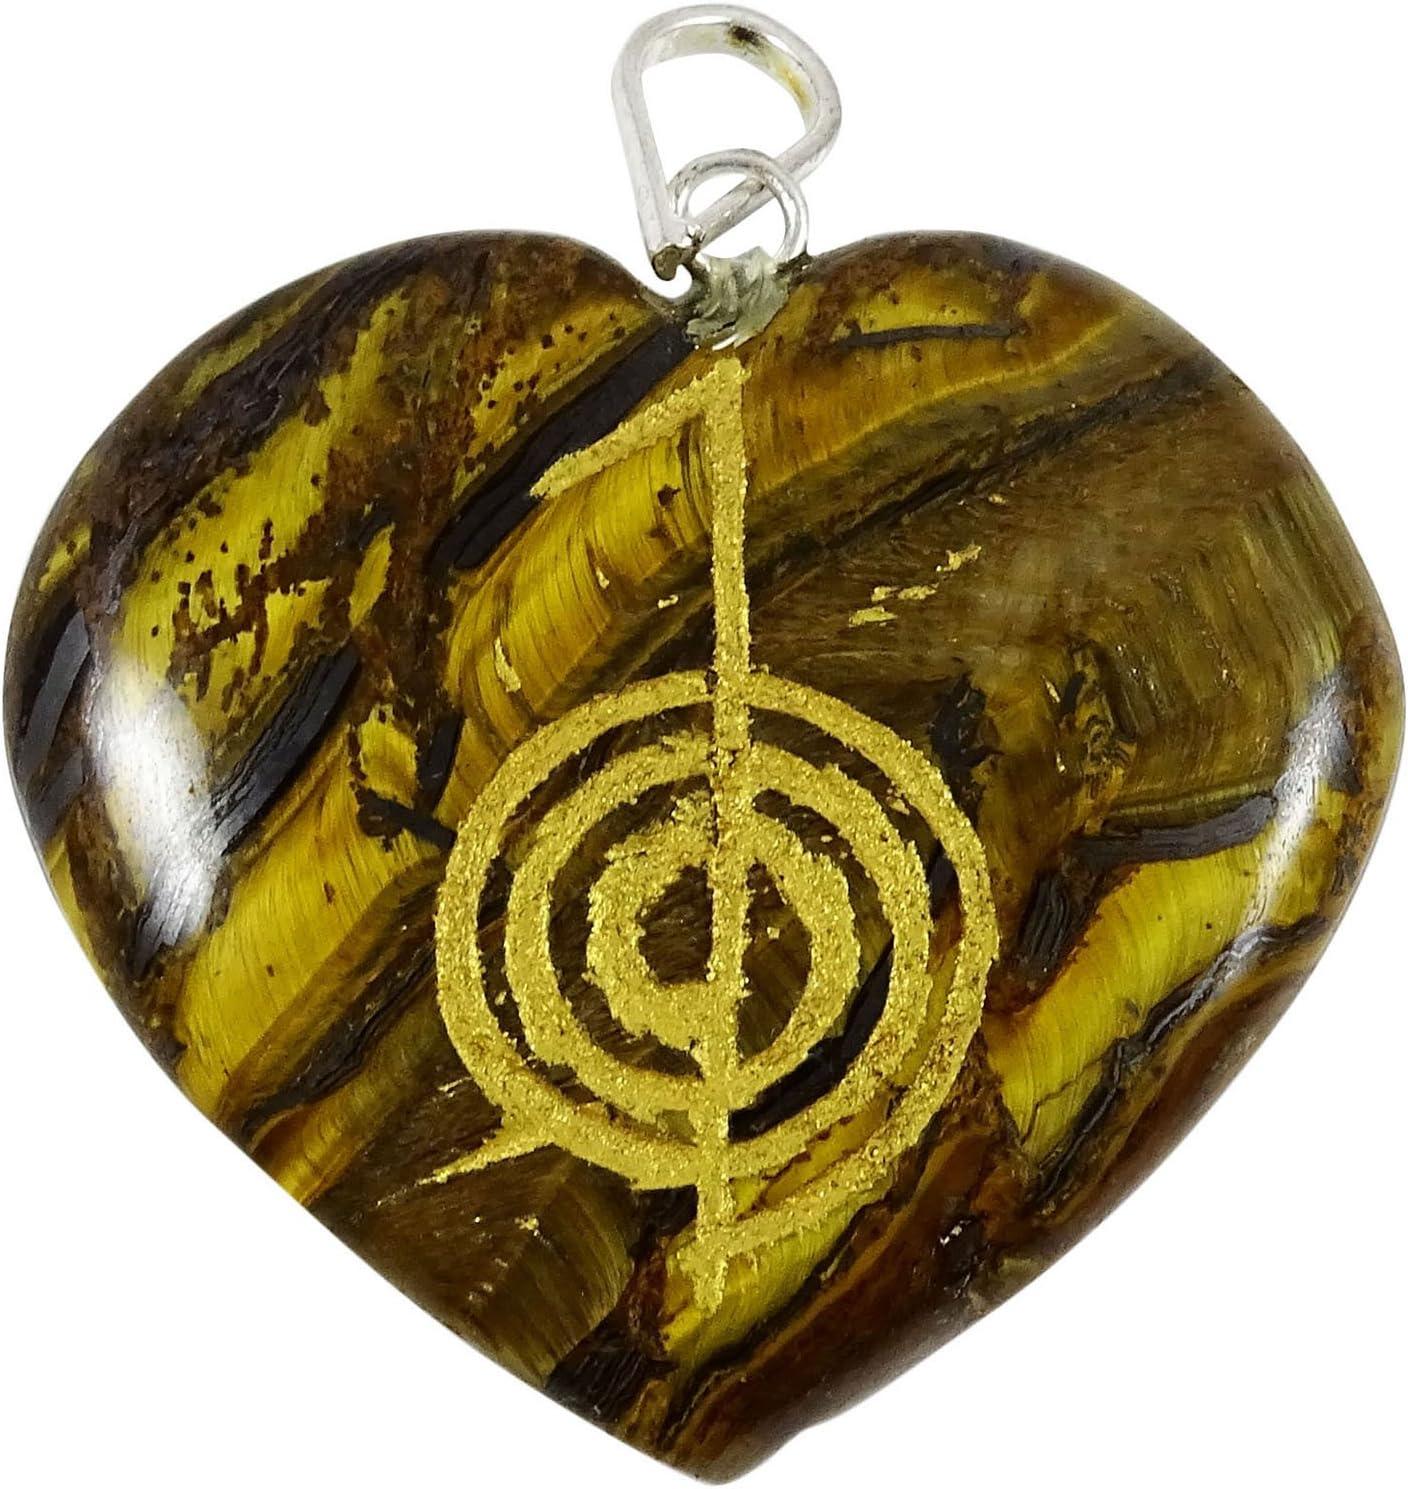 Harmonize Símbolo de Piedra del Ojo del Tigre de Piedra Amuleto en Forma de corazón Reiki Espiritual Colgante